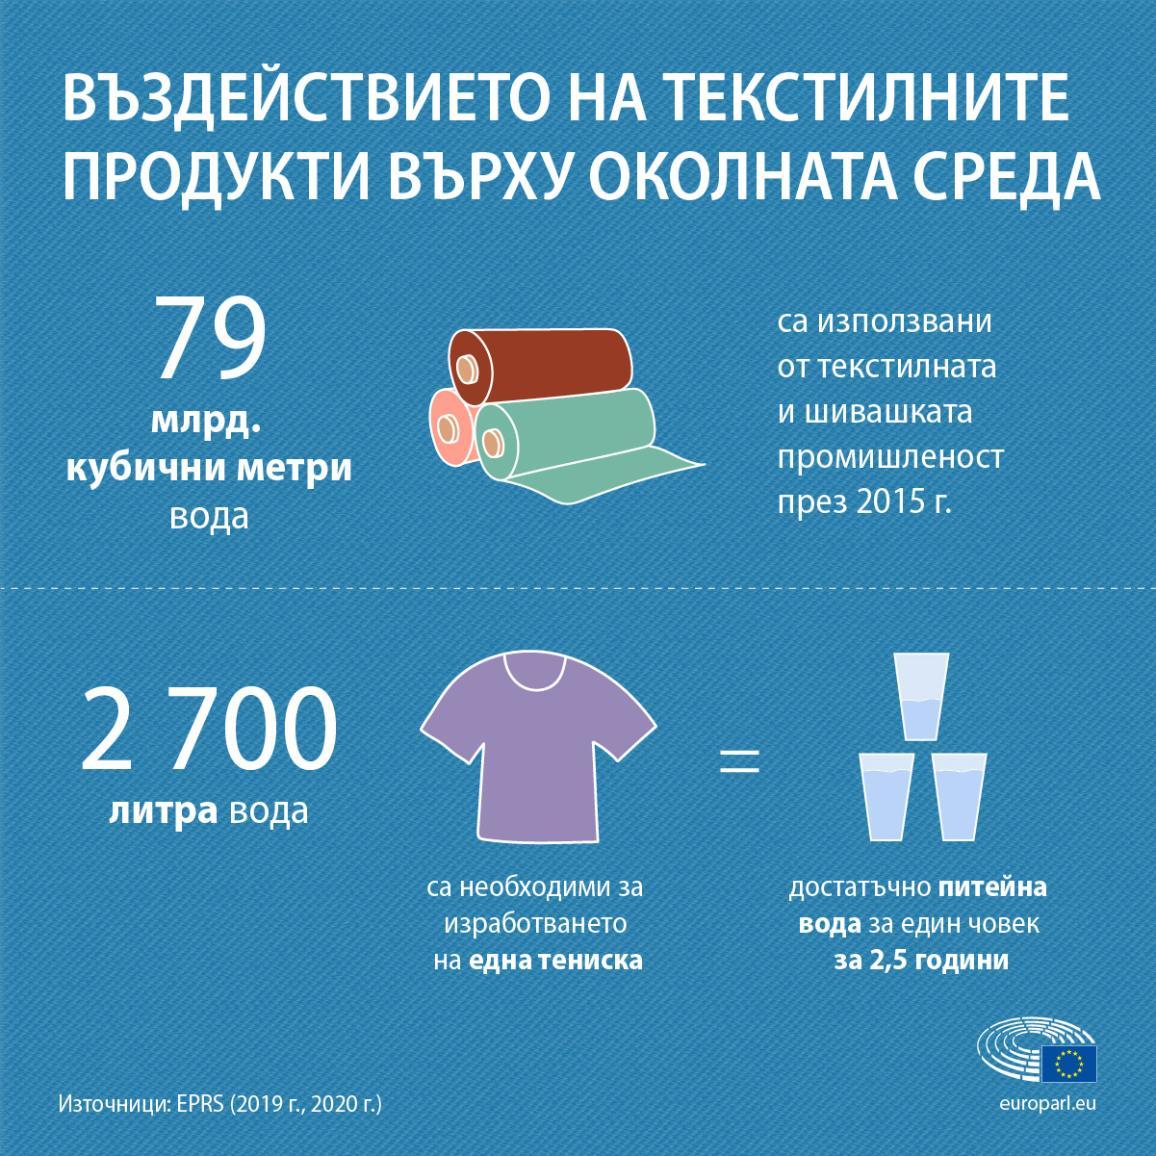 Инфографика за потреблението на вода от текстилната промишленост